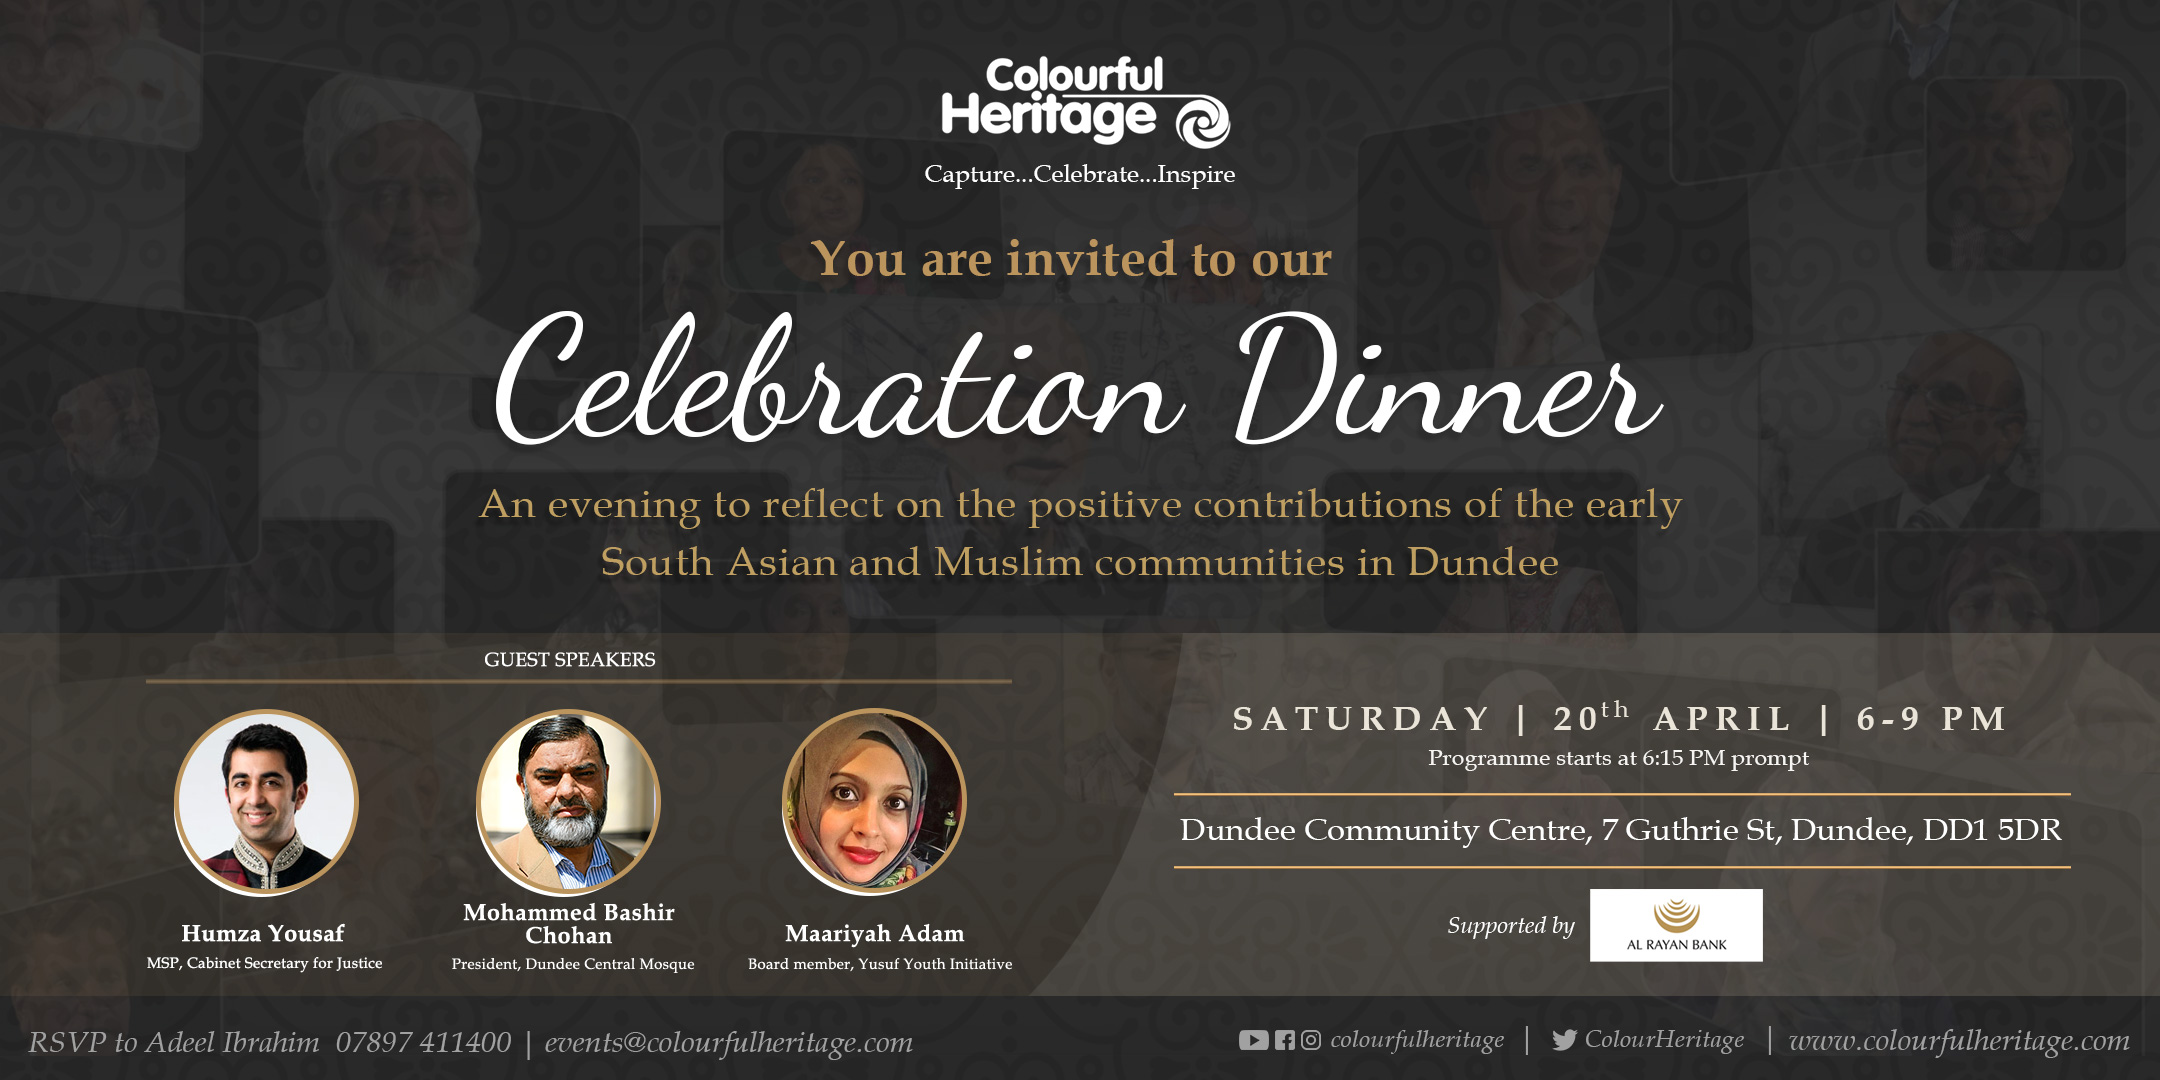 Dundee Dinner Celebration invitation Card